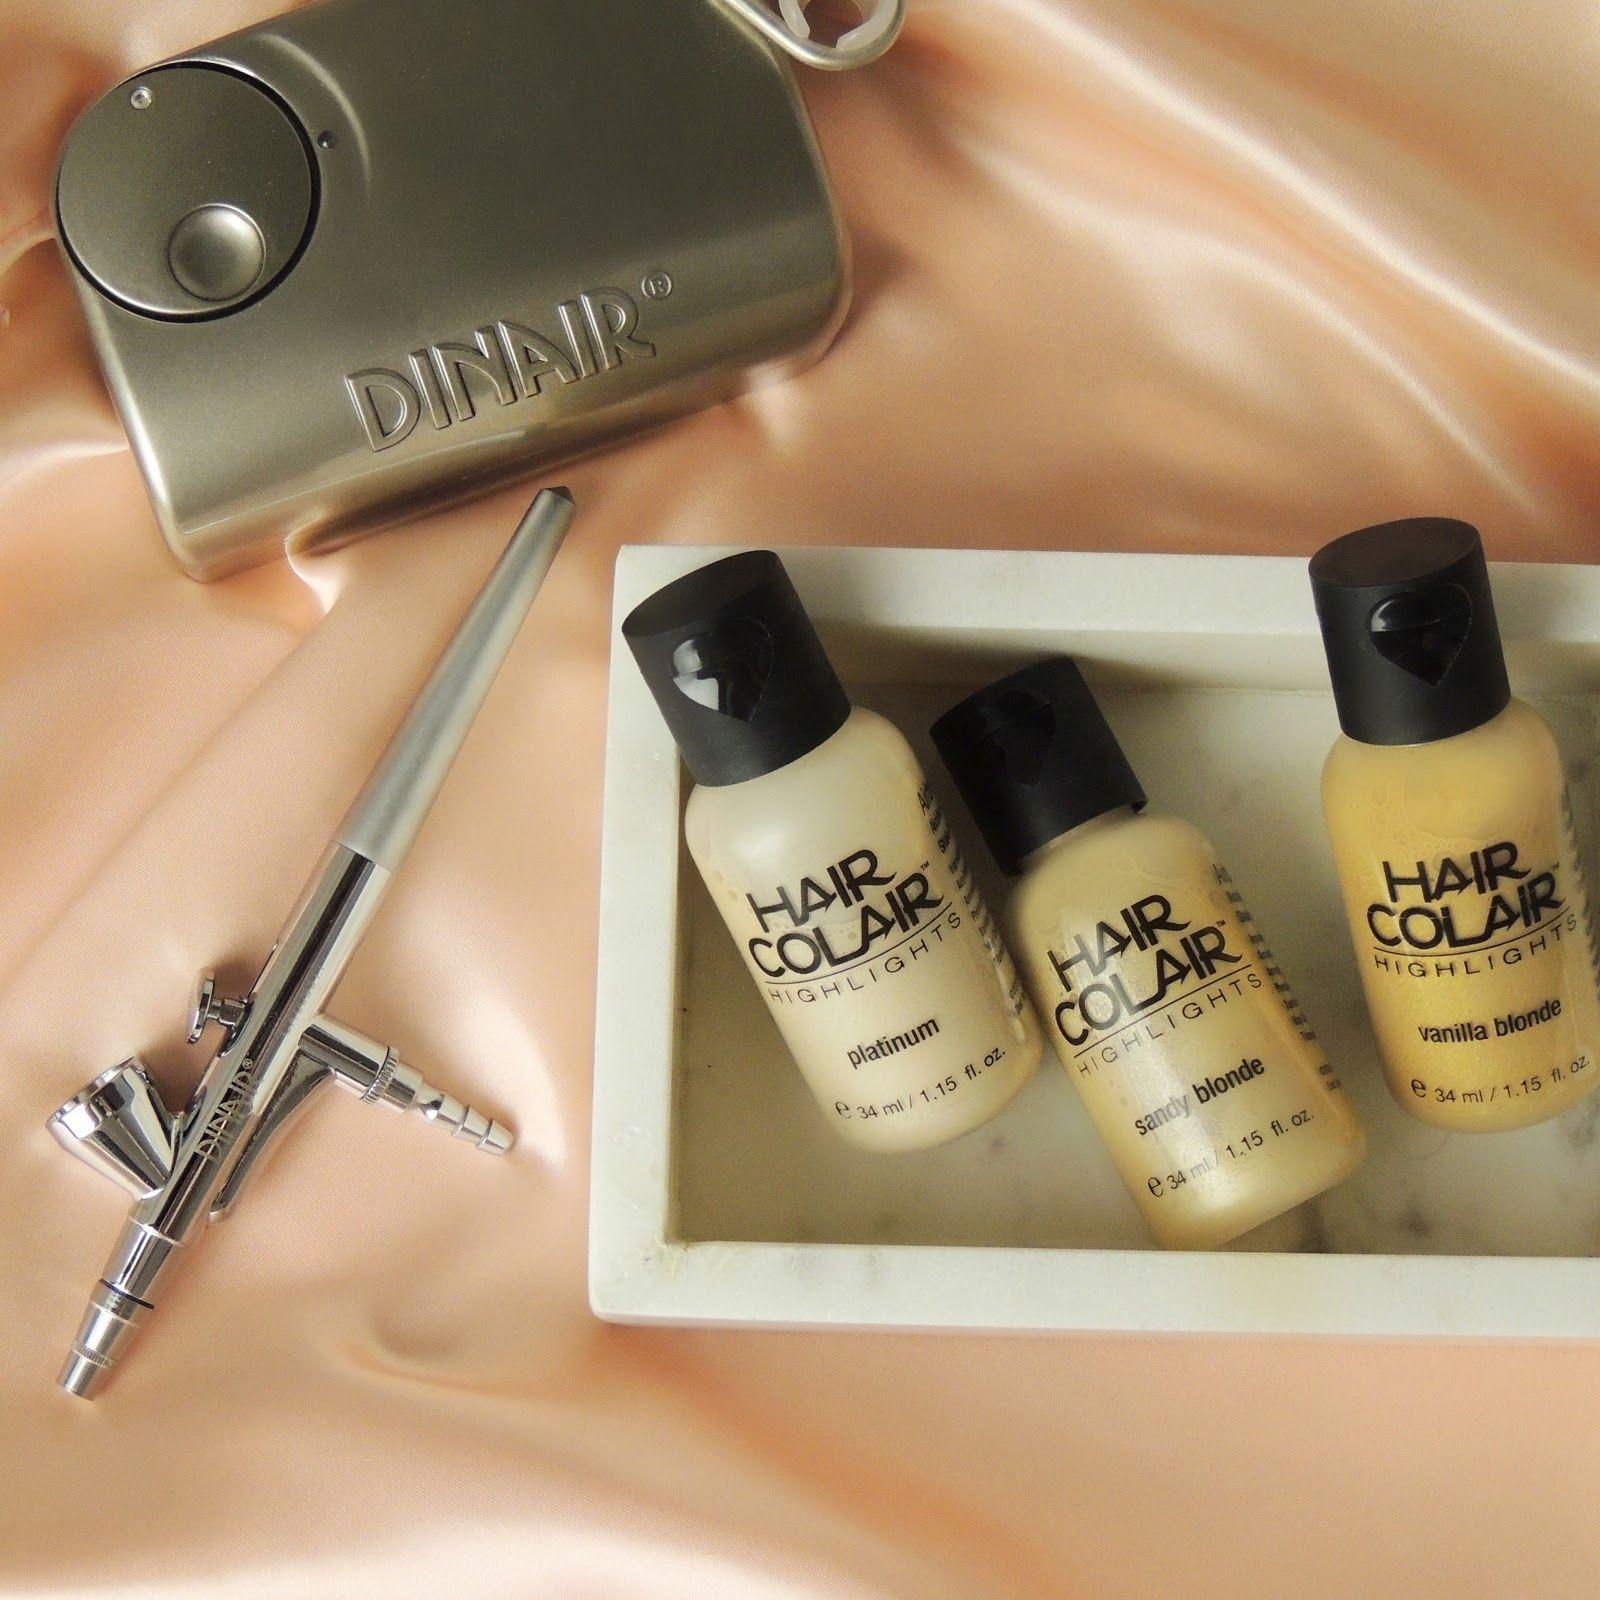 Dinair Hair Colair! Airbrush makeup kit, Airbrush